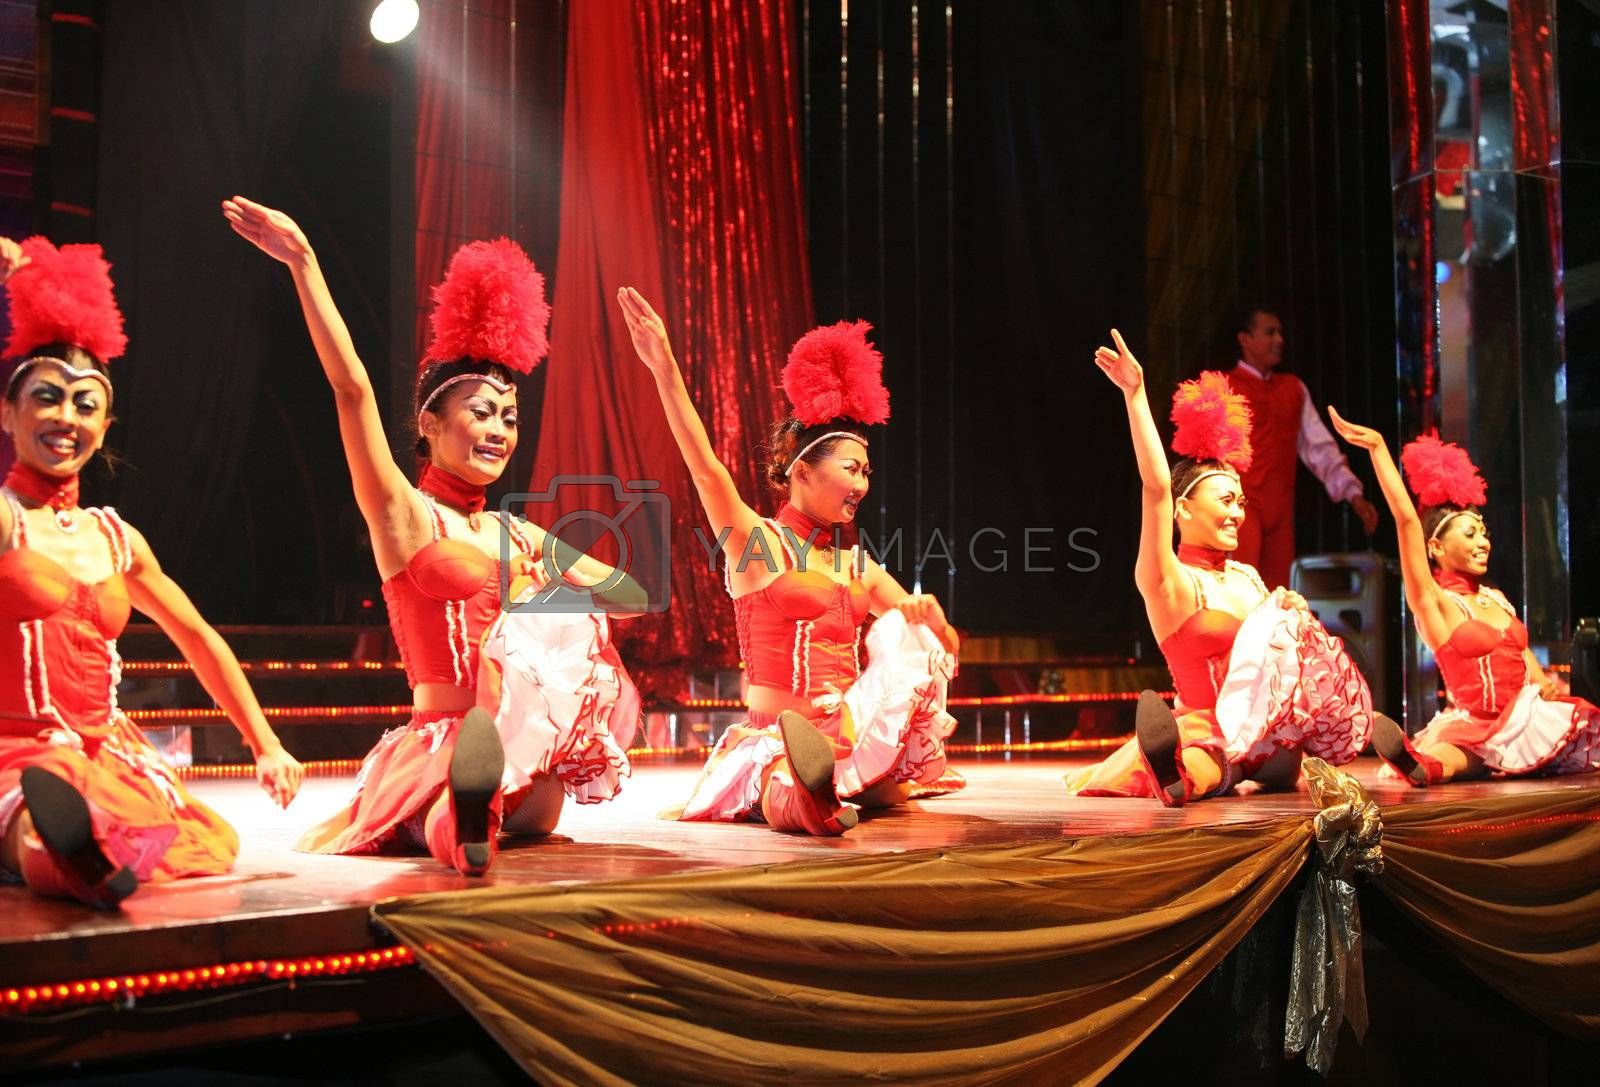 The women the dancer in a night club. Bali. Indonesia